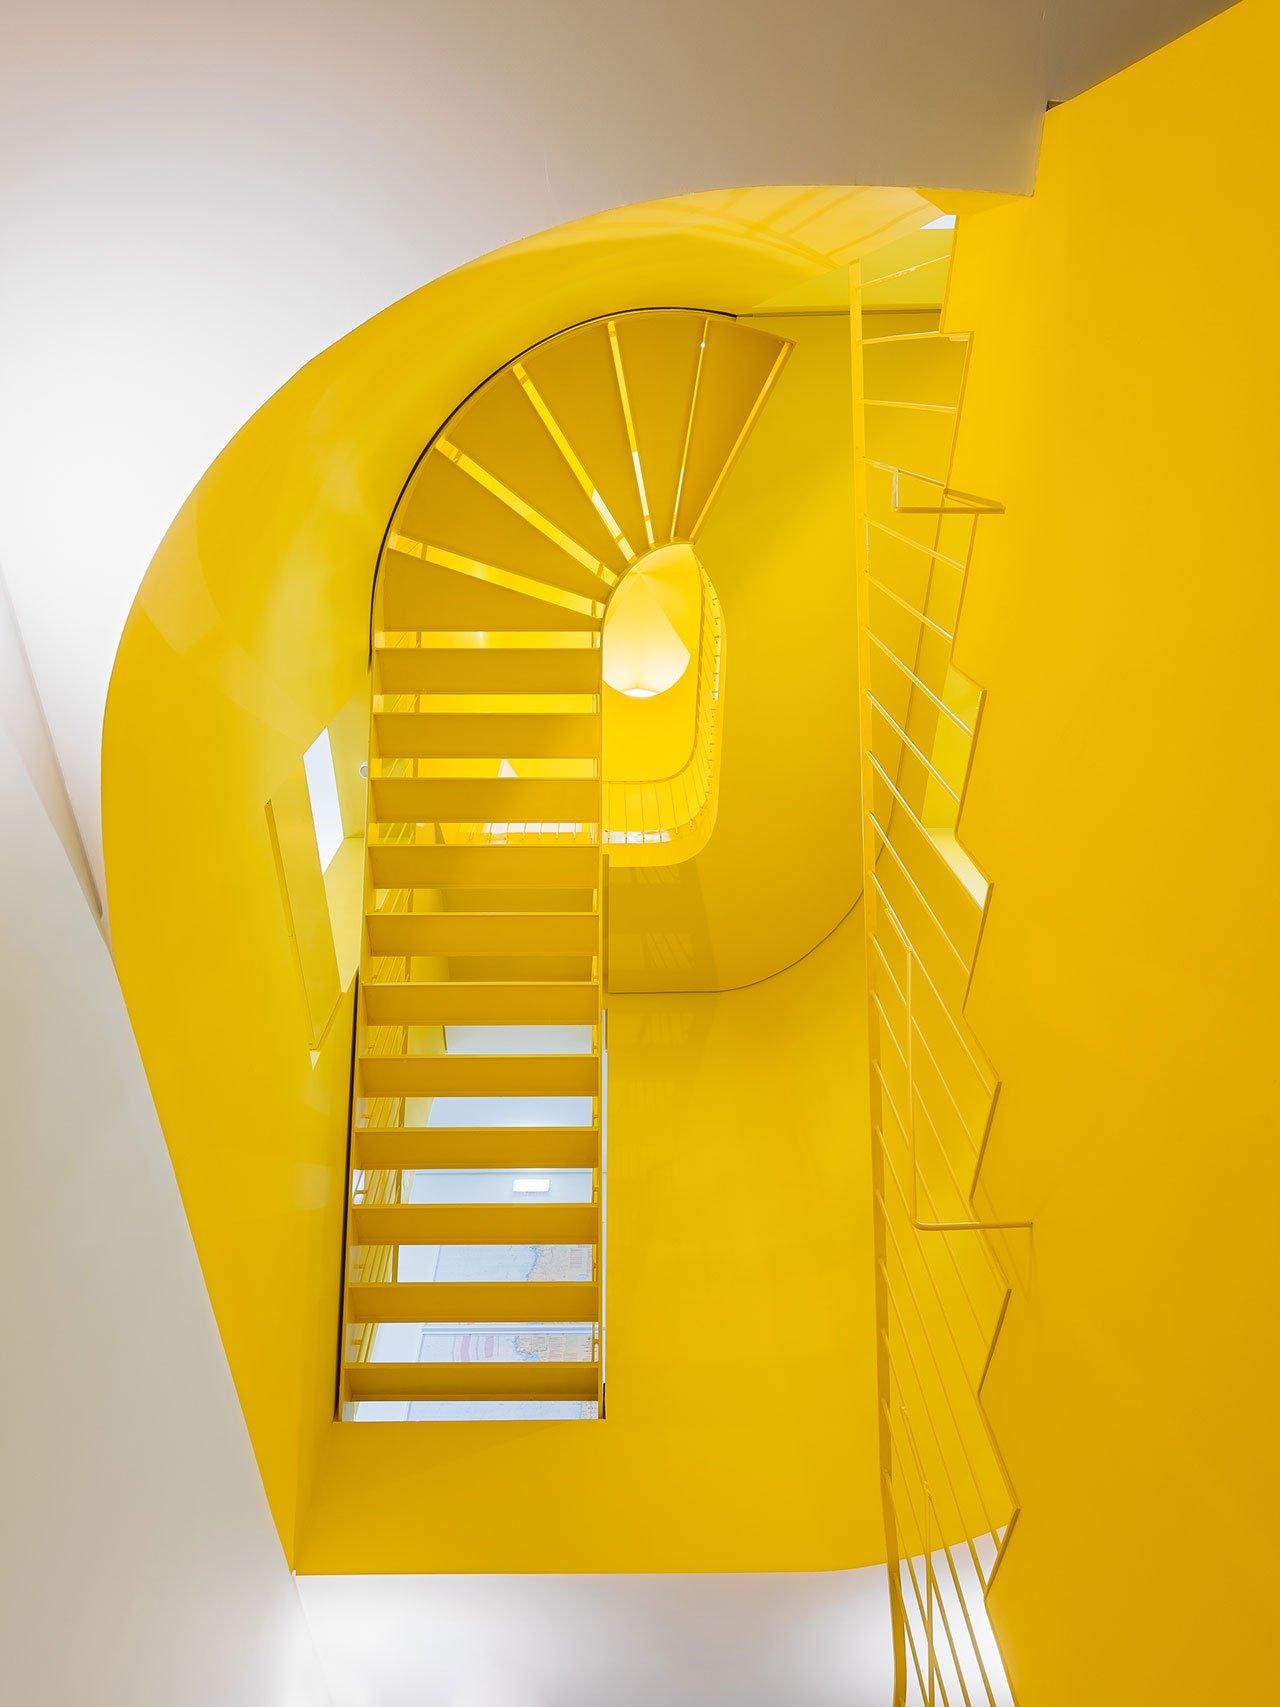 f9_hostel_in_parede_cascais_portugal_aurora_arquitectos_photo_do_mal_o_menos_yatzer.jpg